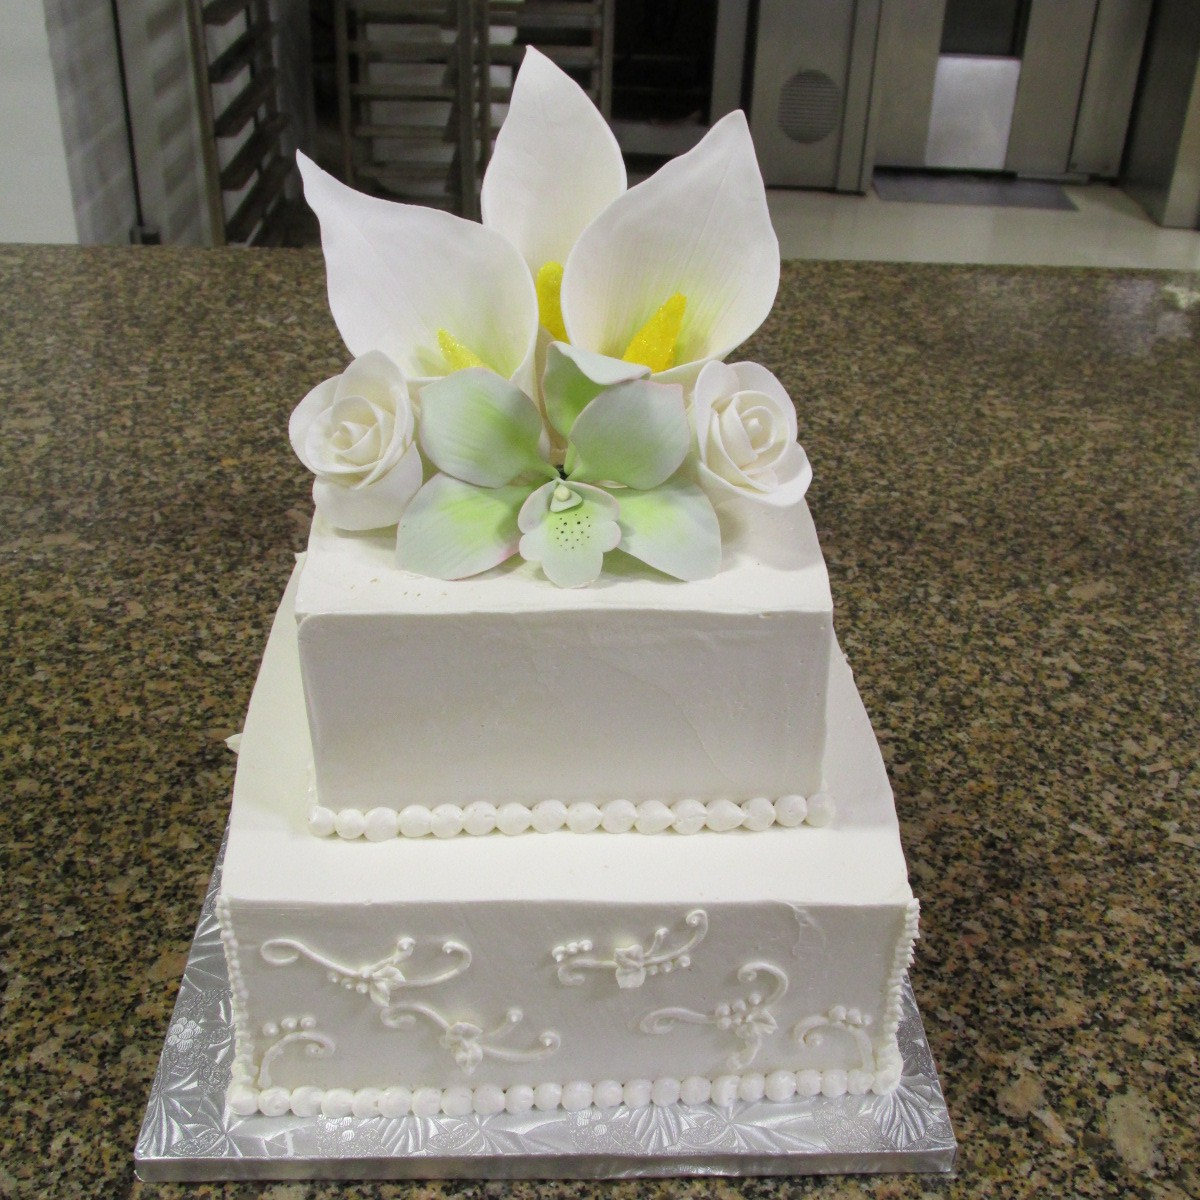 Wedding Cake with Handmade Gumpaste Flowers